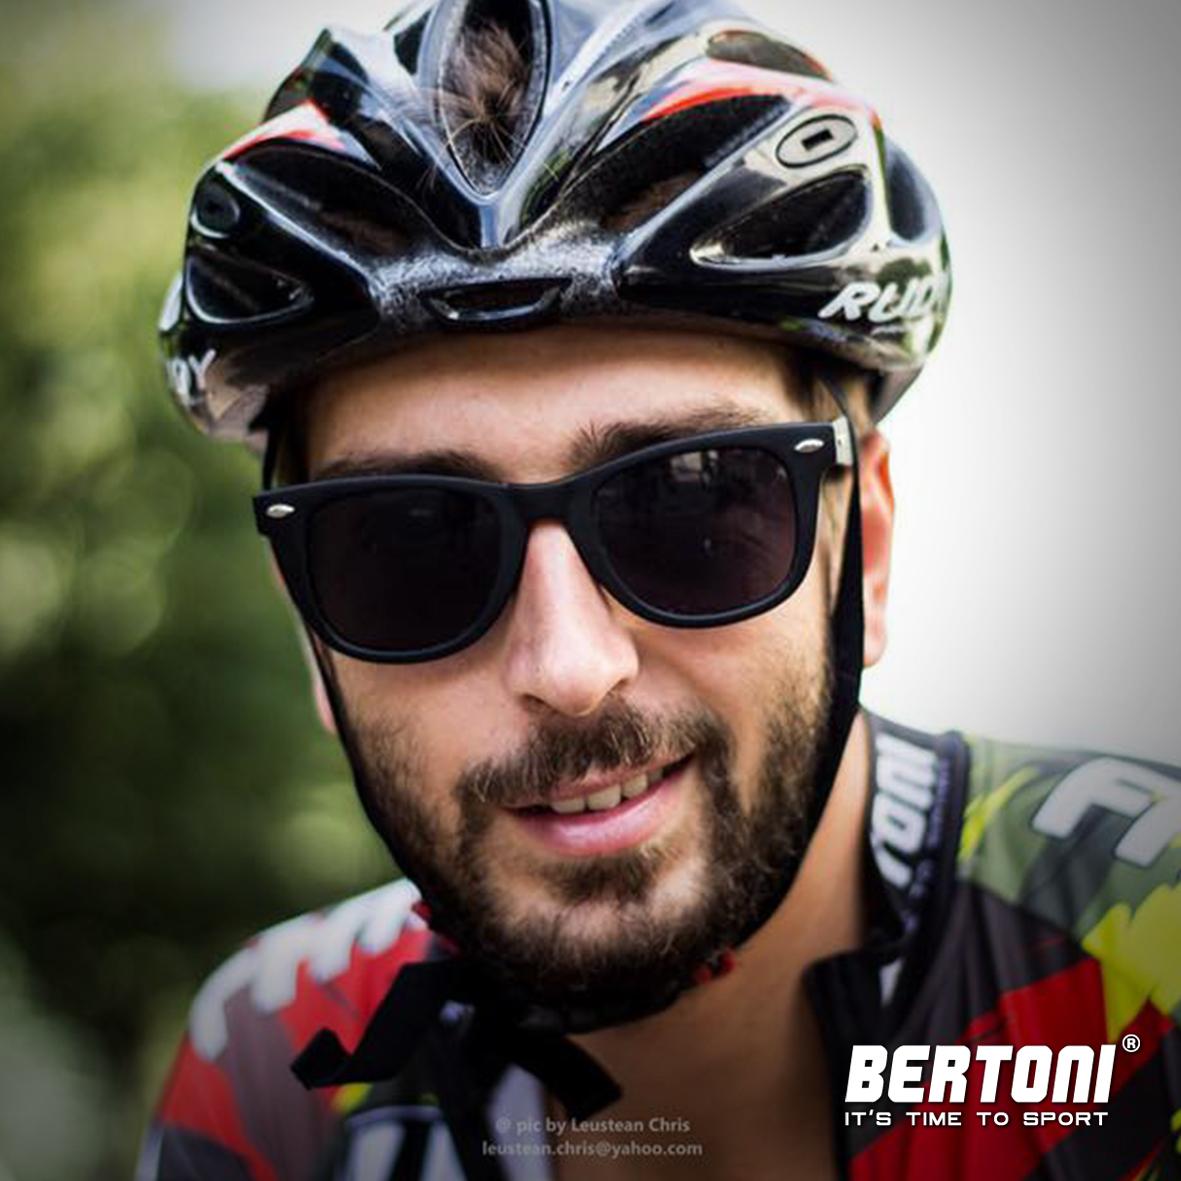 Raven Fixed - Ciclismo - Italia